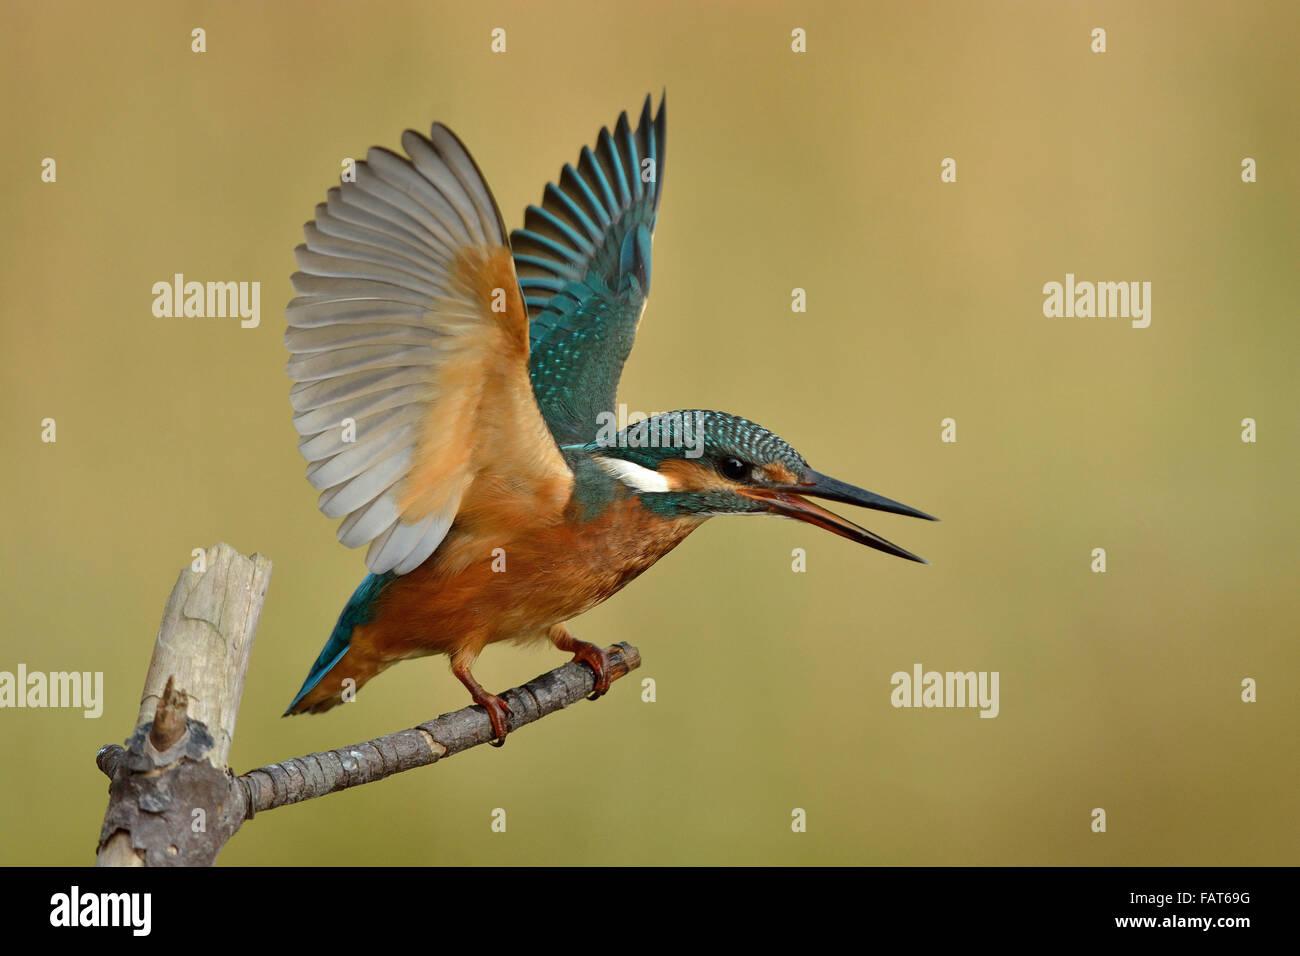 Eurasian Kingfisher in territorial behavior - Stock Image